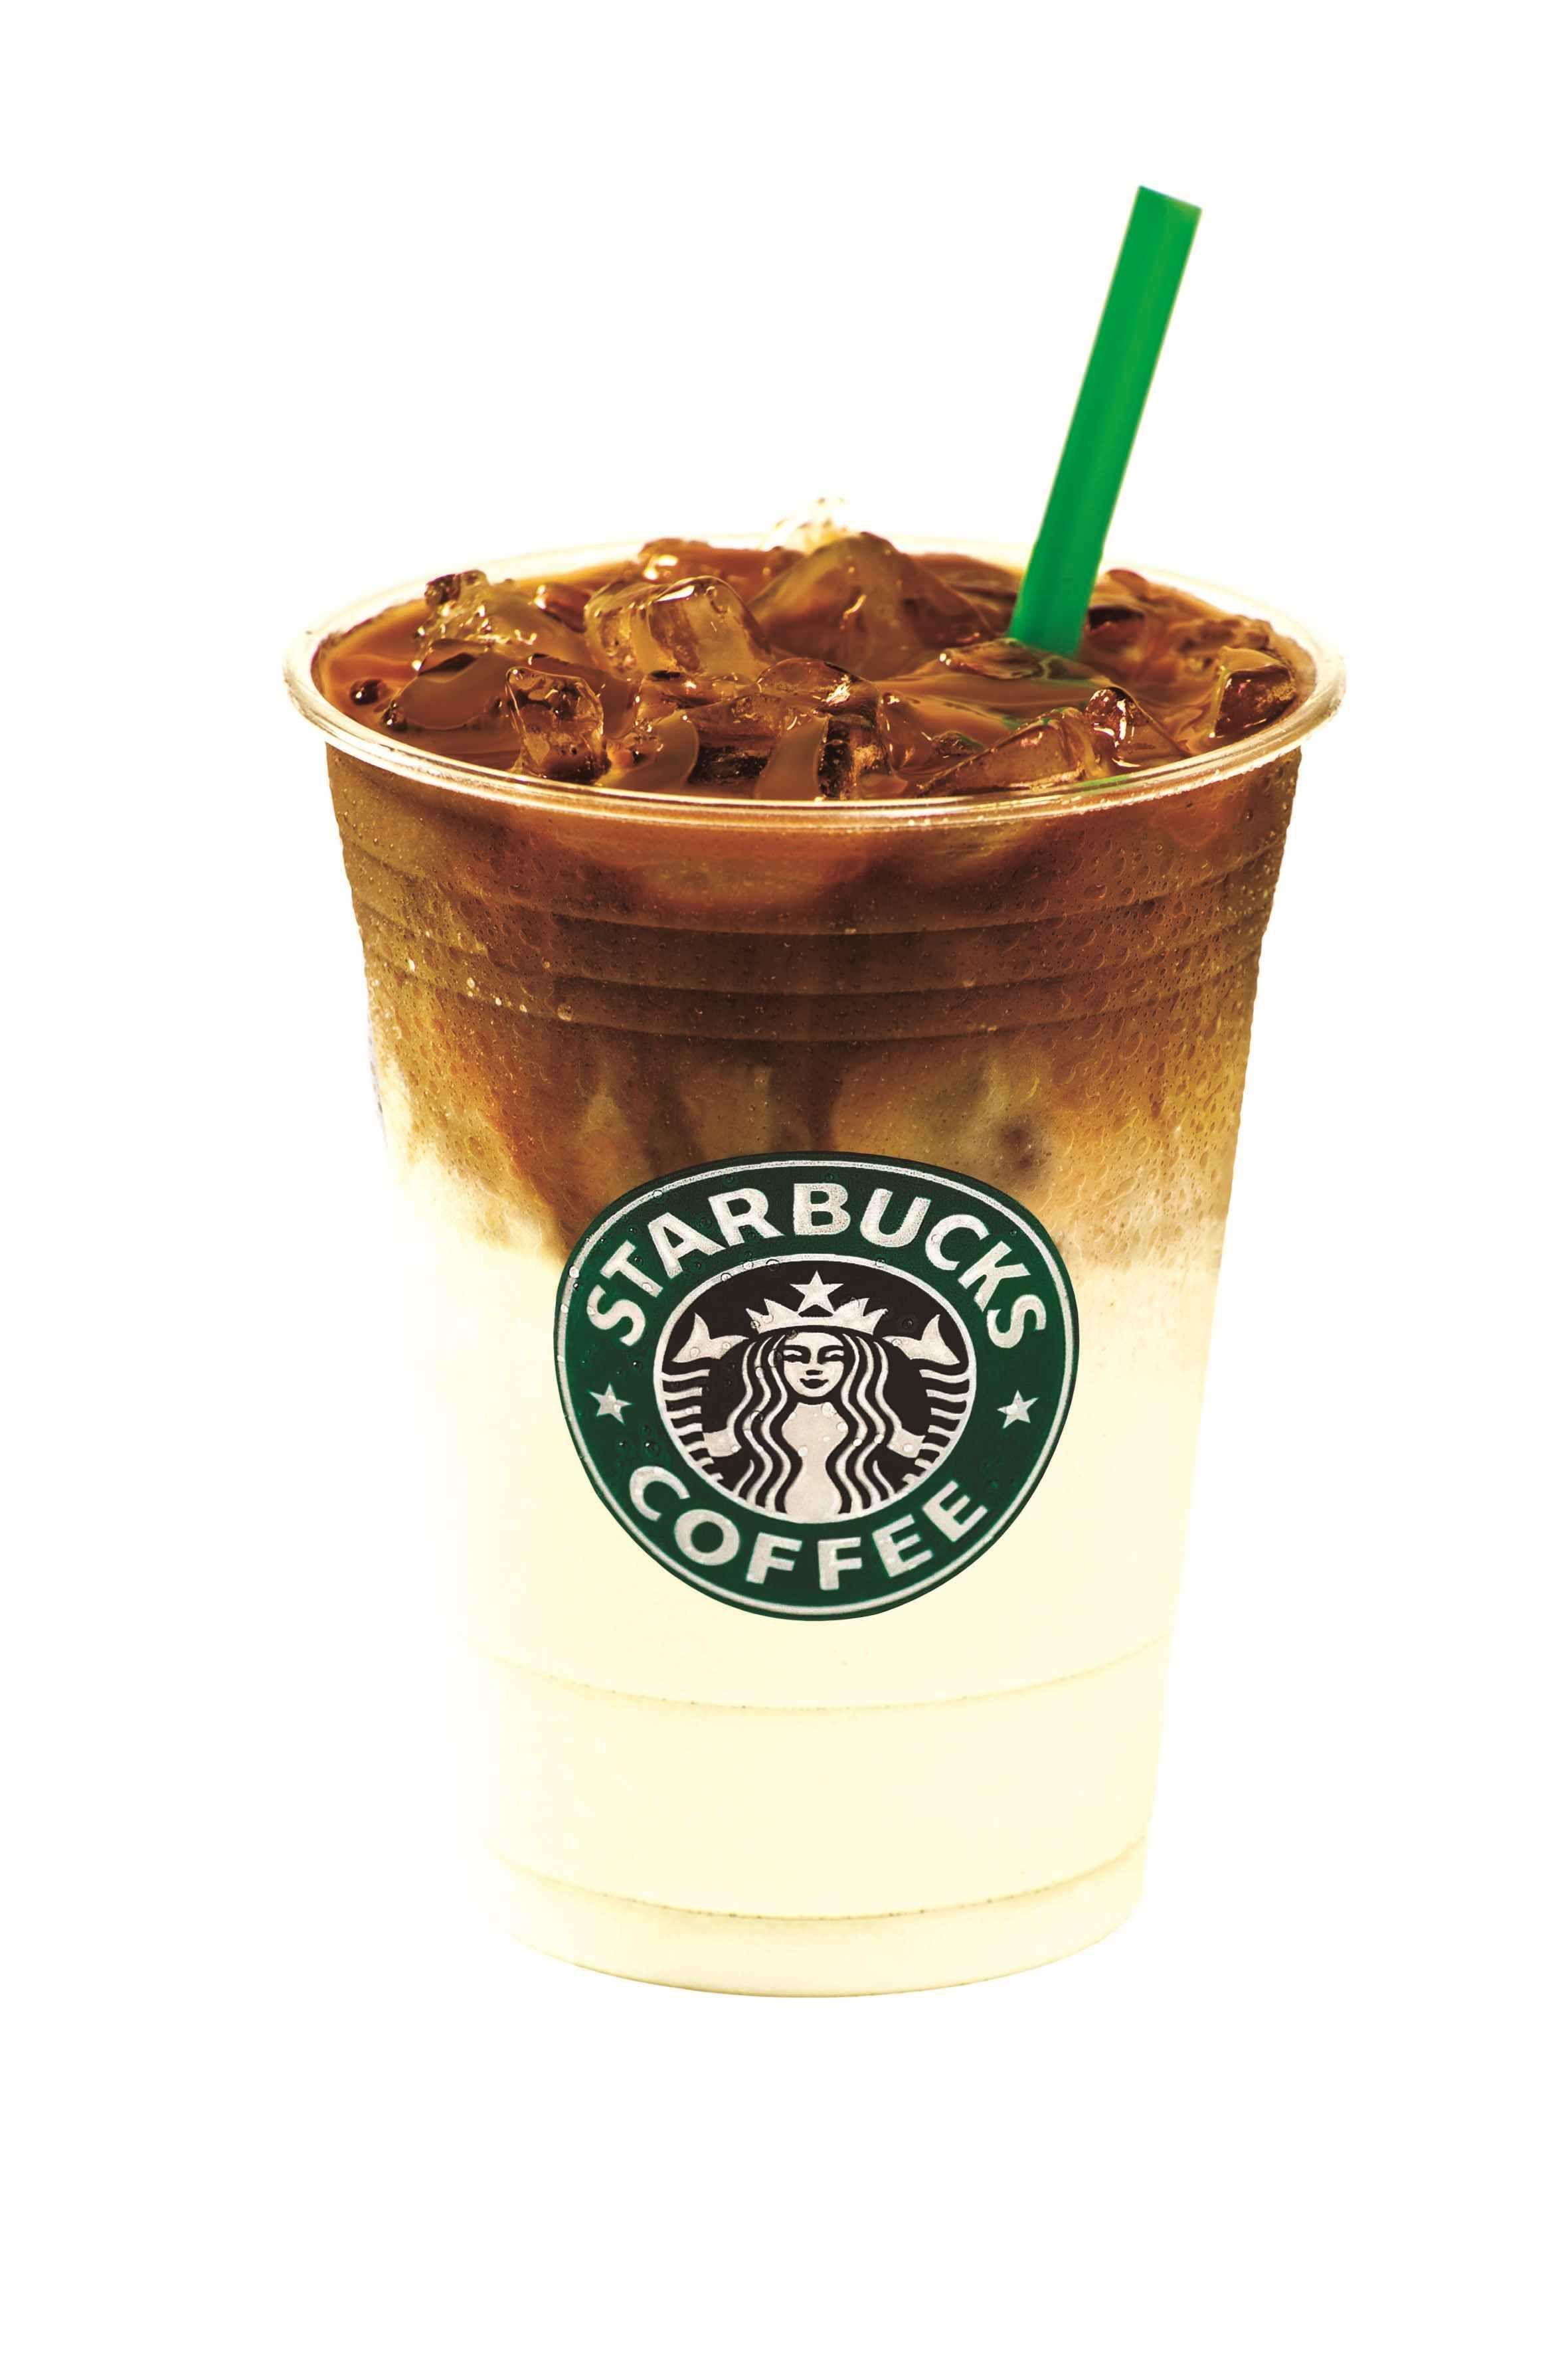 Iced starbucks coffee just looks cool coffee cake